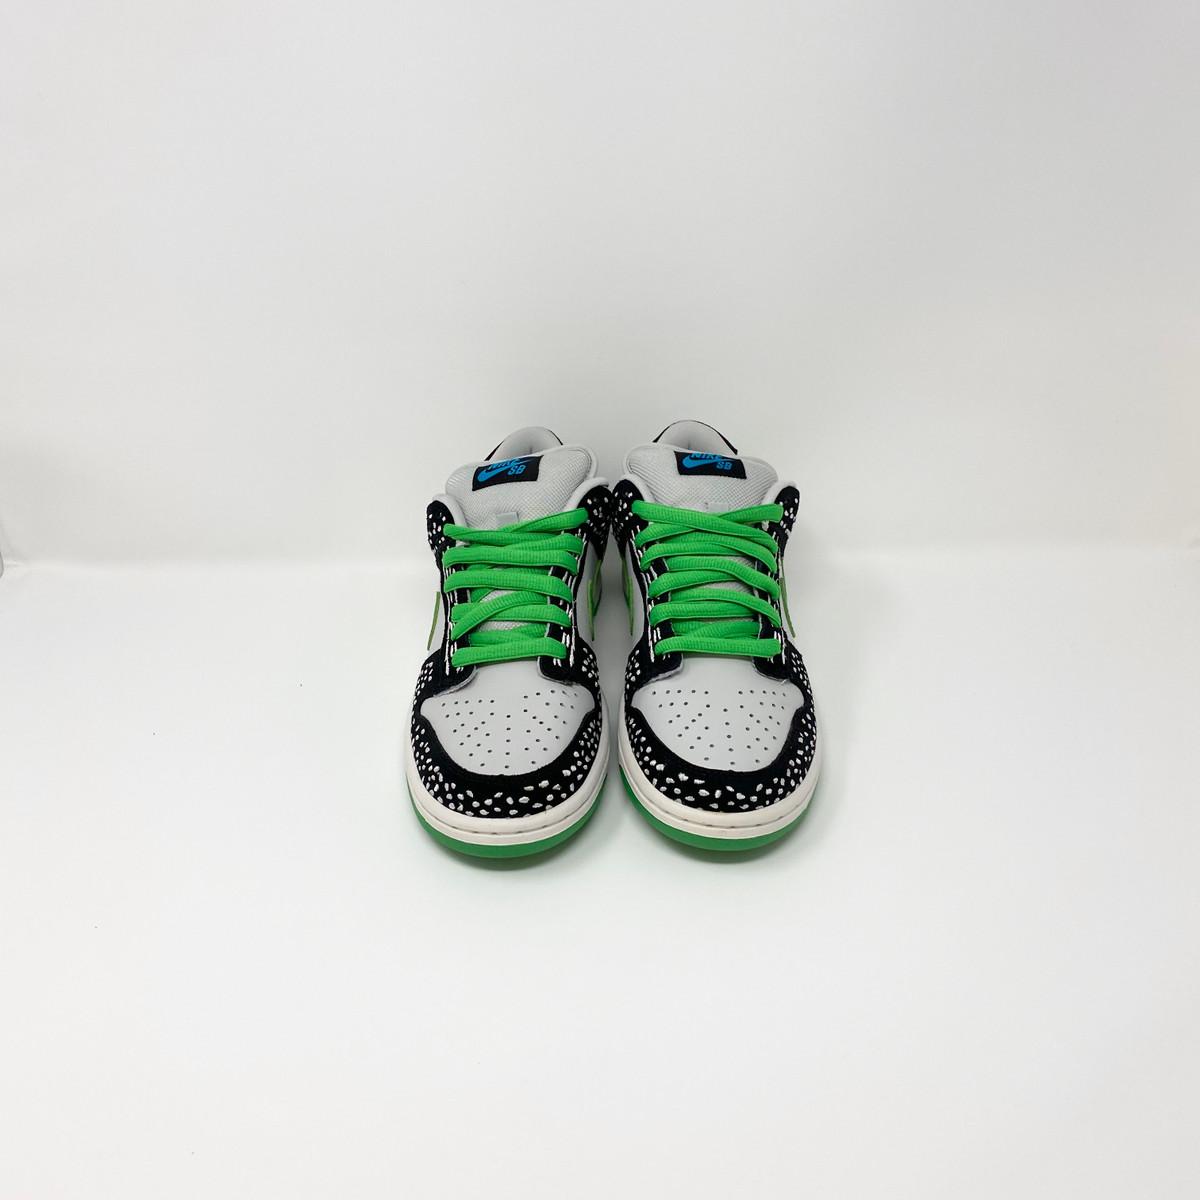 Nike Dunk Low Prem SB Loon